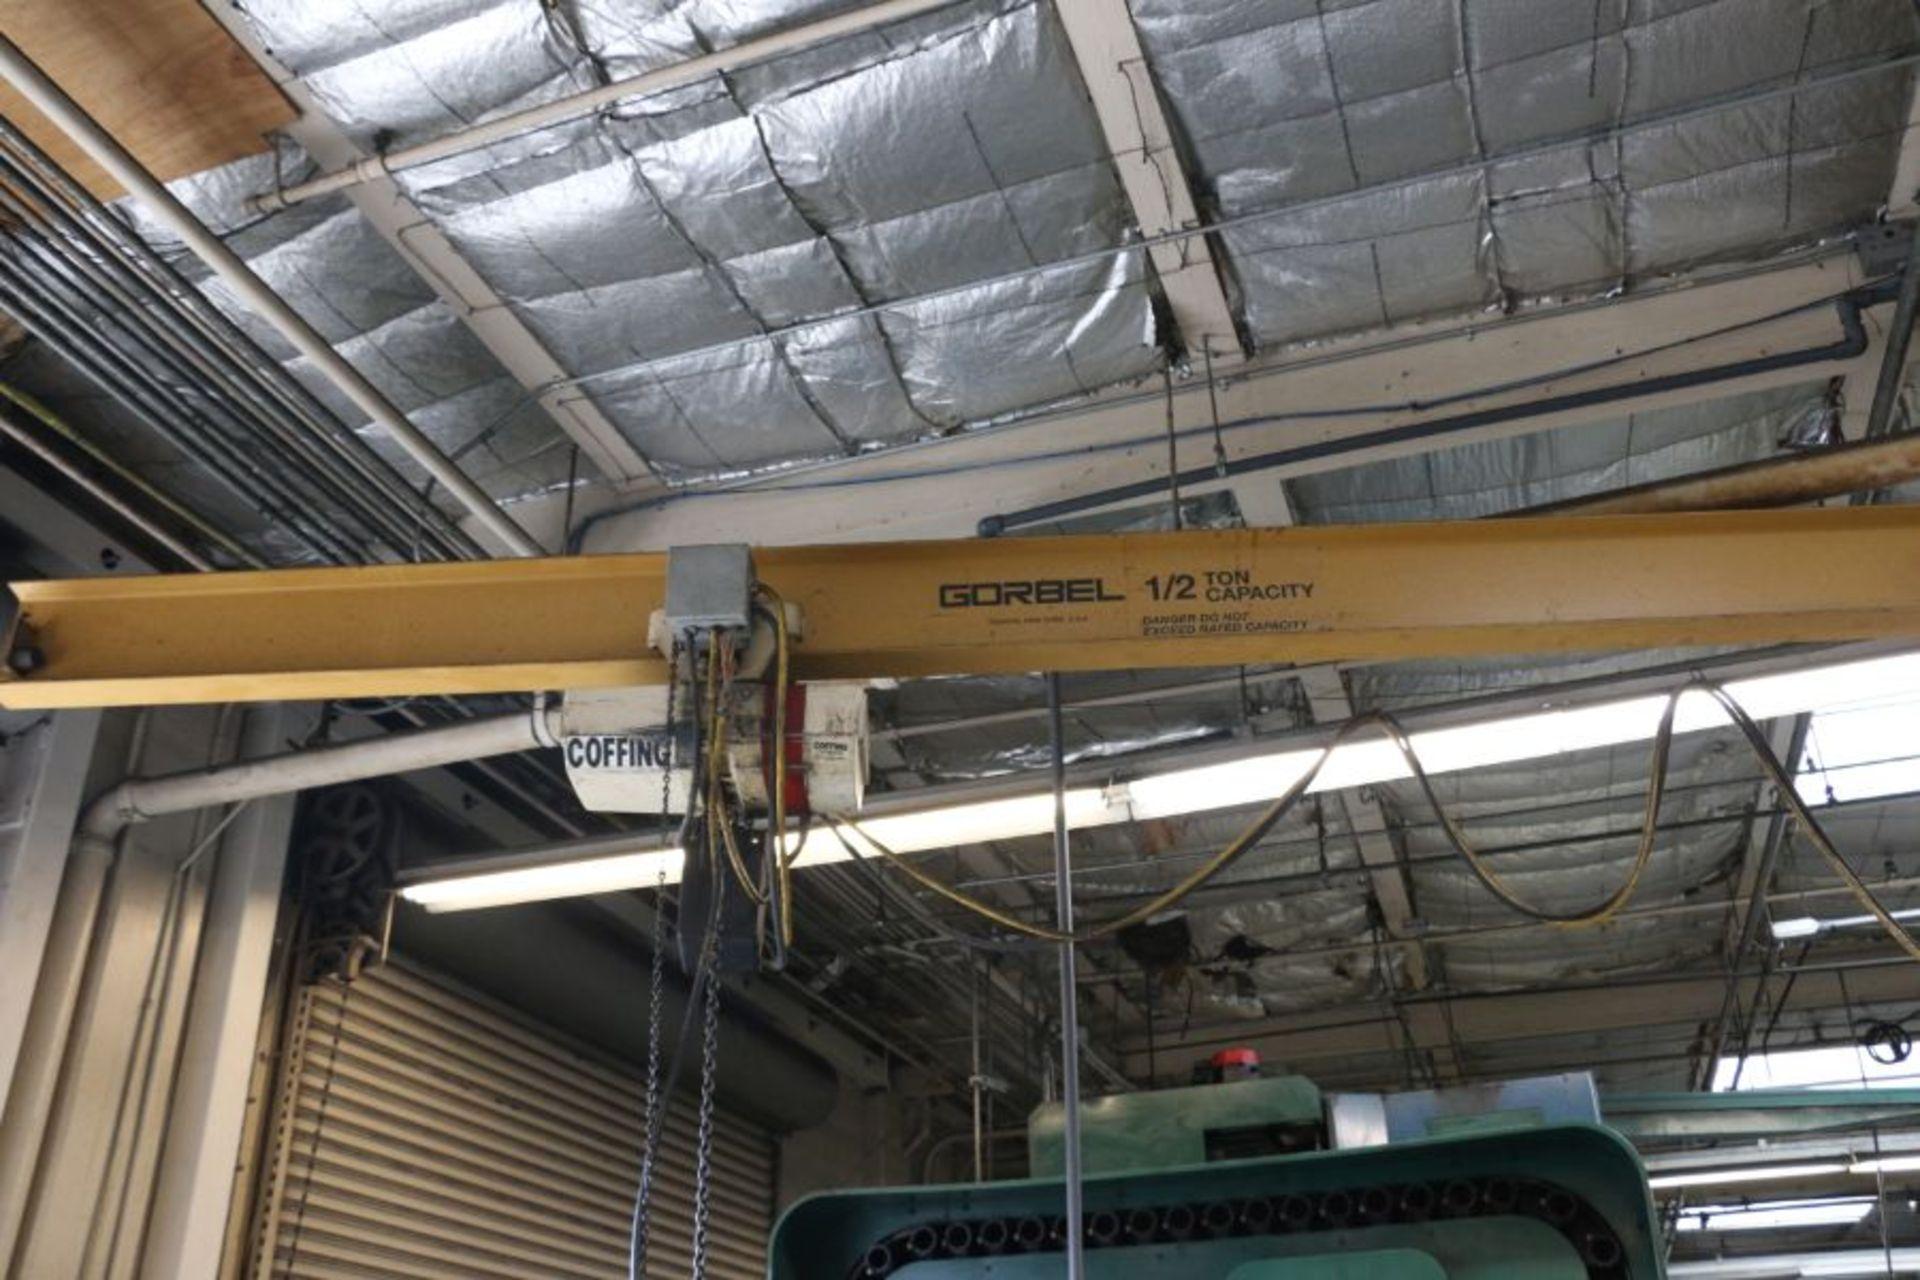 Lot 100 - Gorbel 1/2 Ton Jib Crane with 1/2 Ton Coffing Hoist